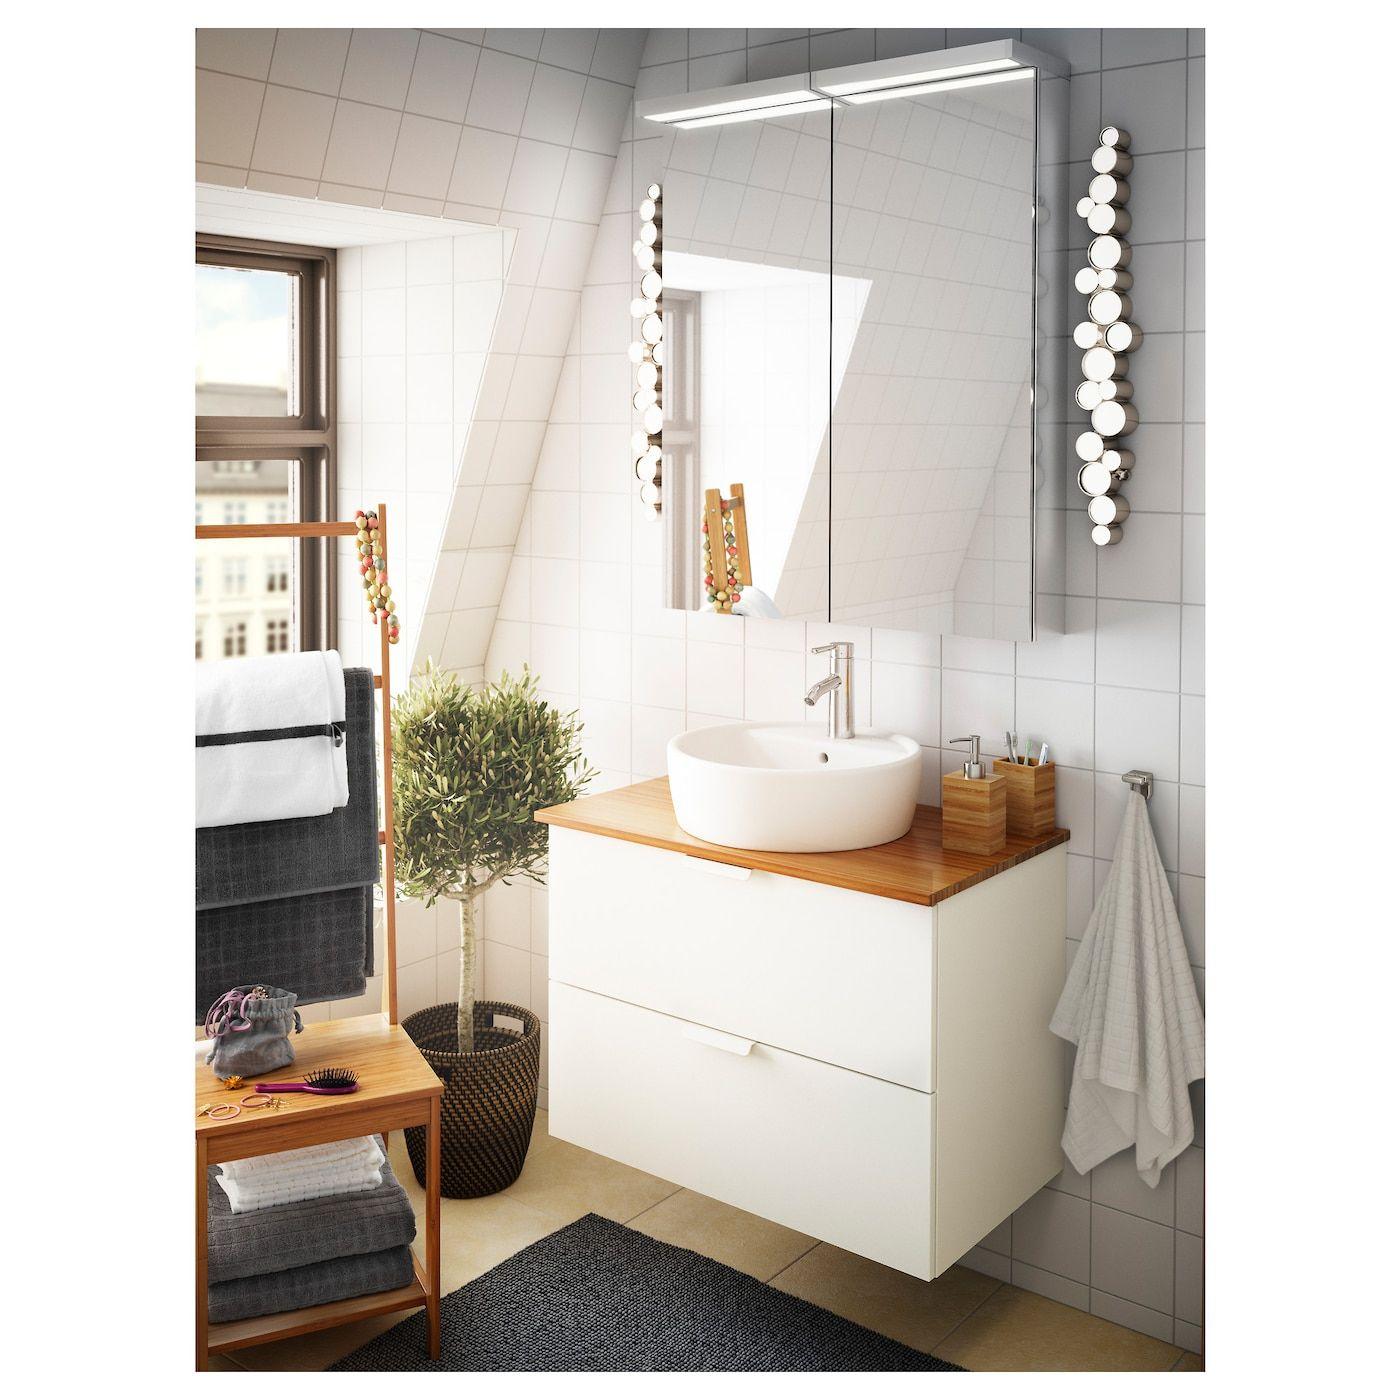 Tolken Countertop Bamboo 32 1 4x19 1 4 Ikea Diy Bathroom Remodel Small Bathroom Remodel Bathrooms Remodel